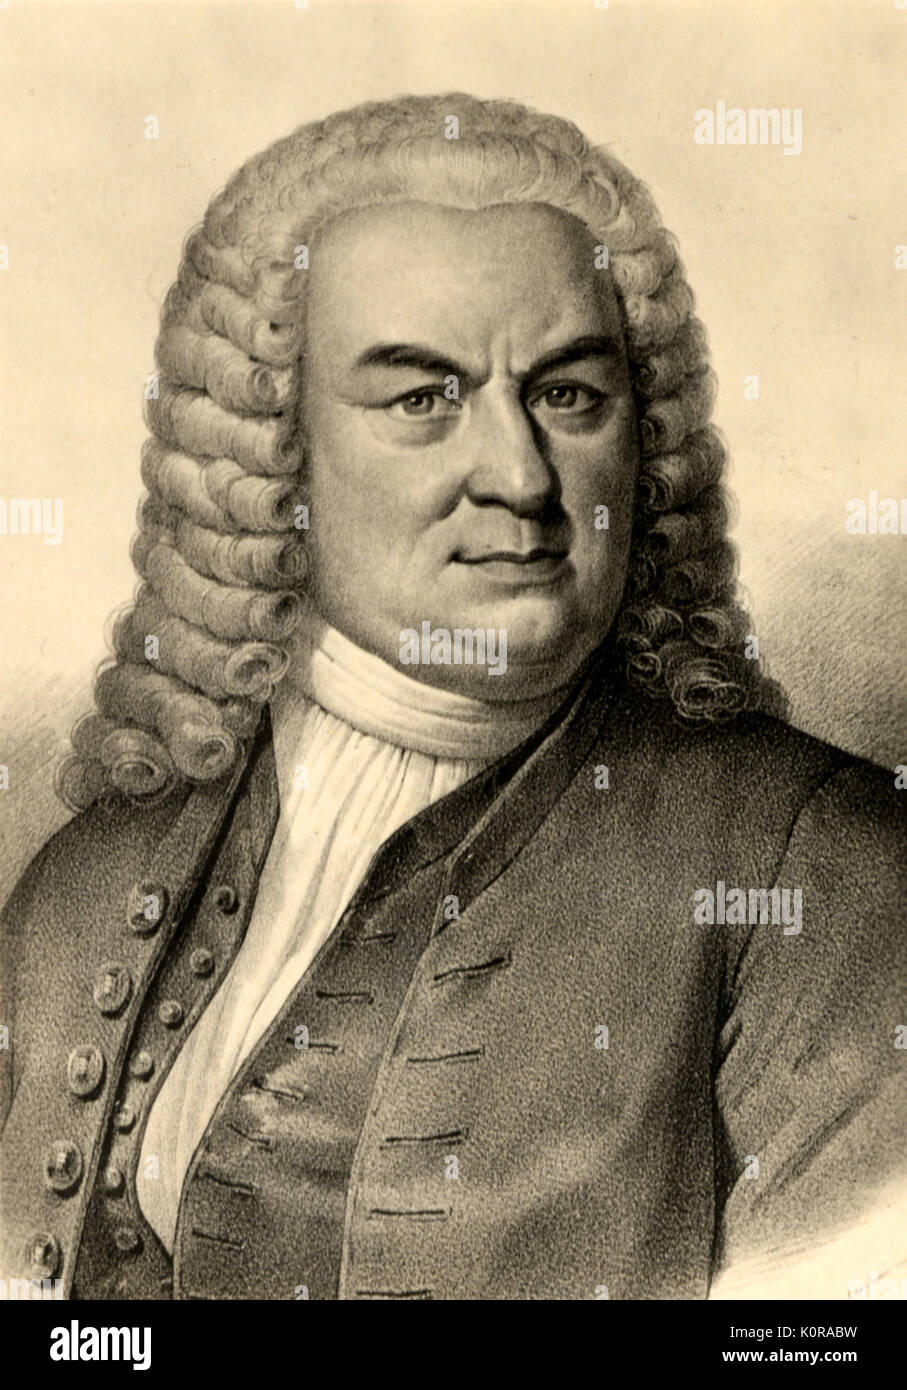 Photo Johann Sebastian Bach,1685-1750,German composer,violist